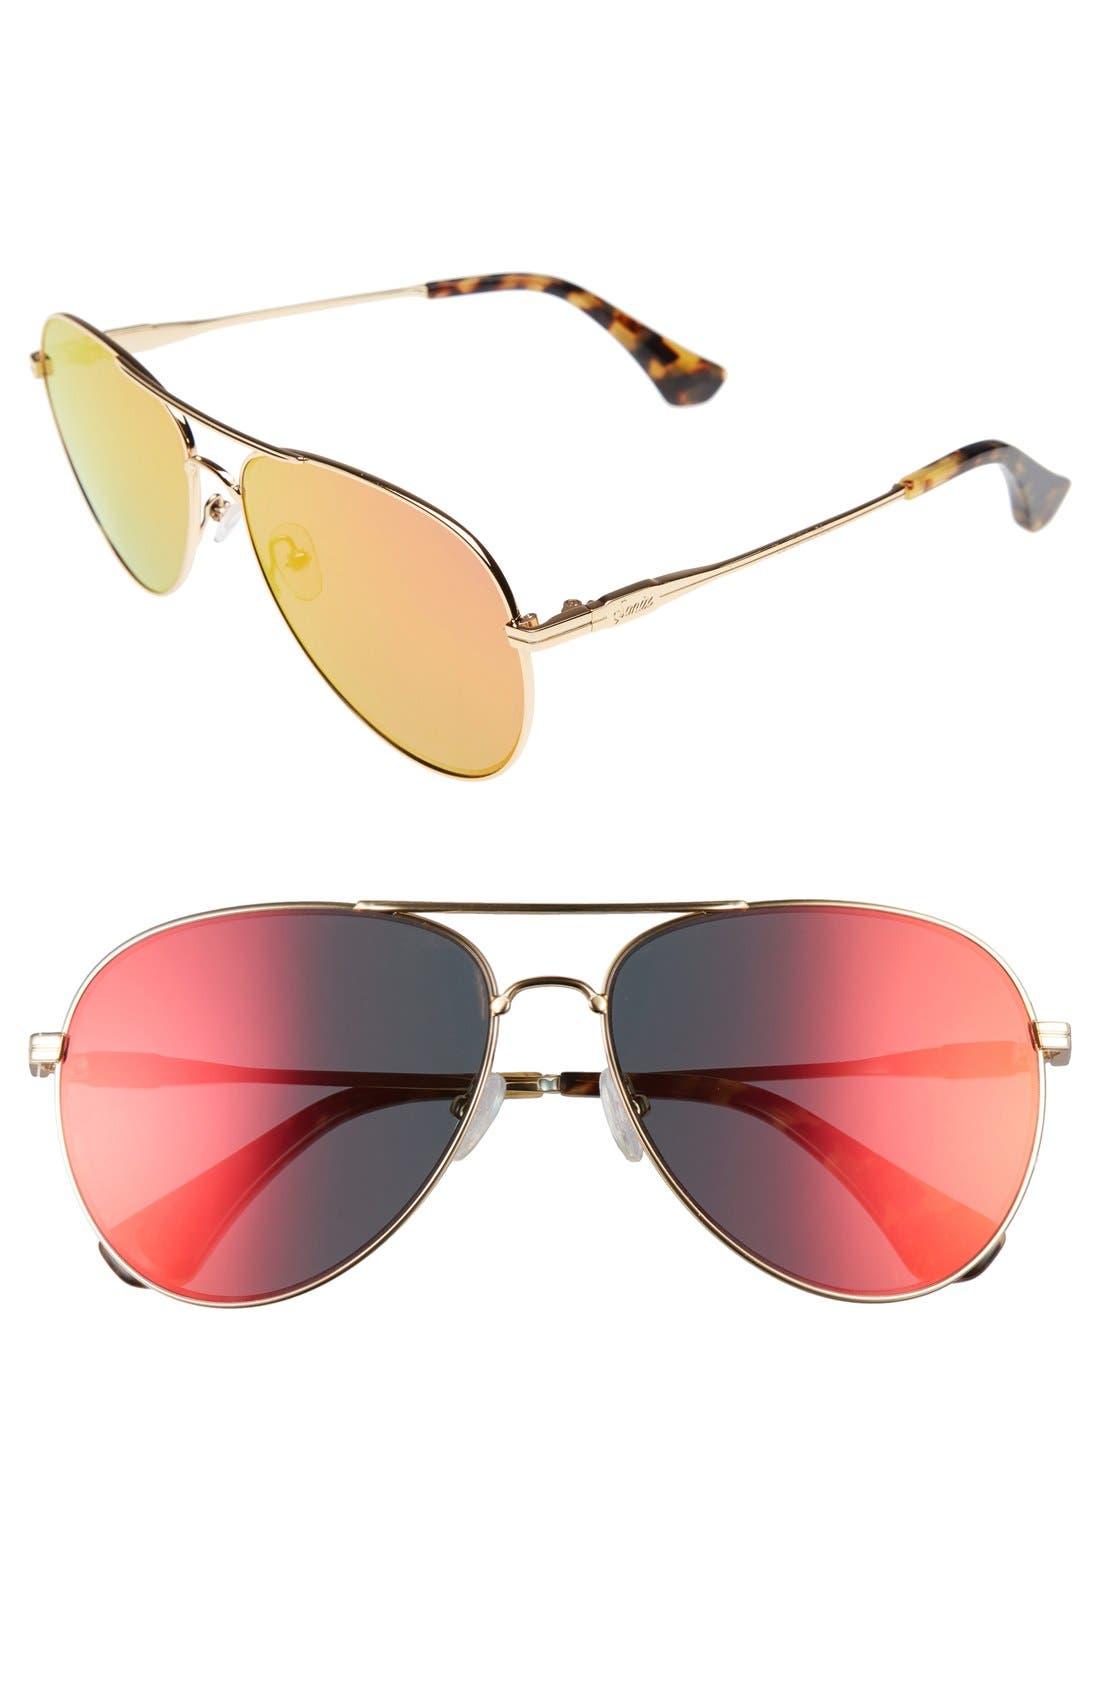 Lodi 62mm Mirrored Aviator Sunglasses,                             Main thumbnail 3, color,